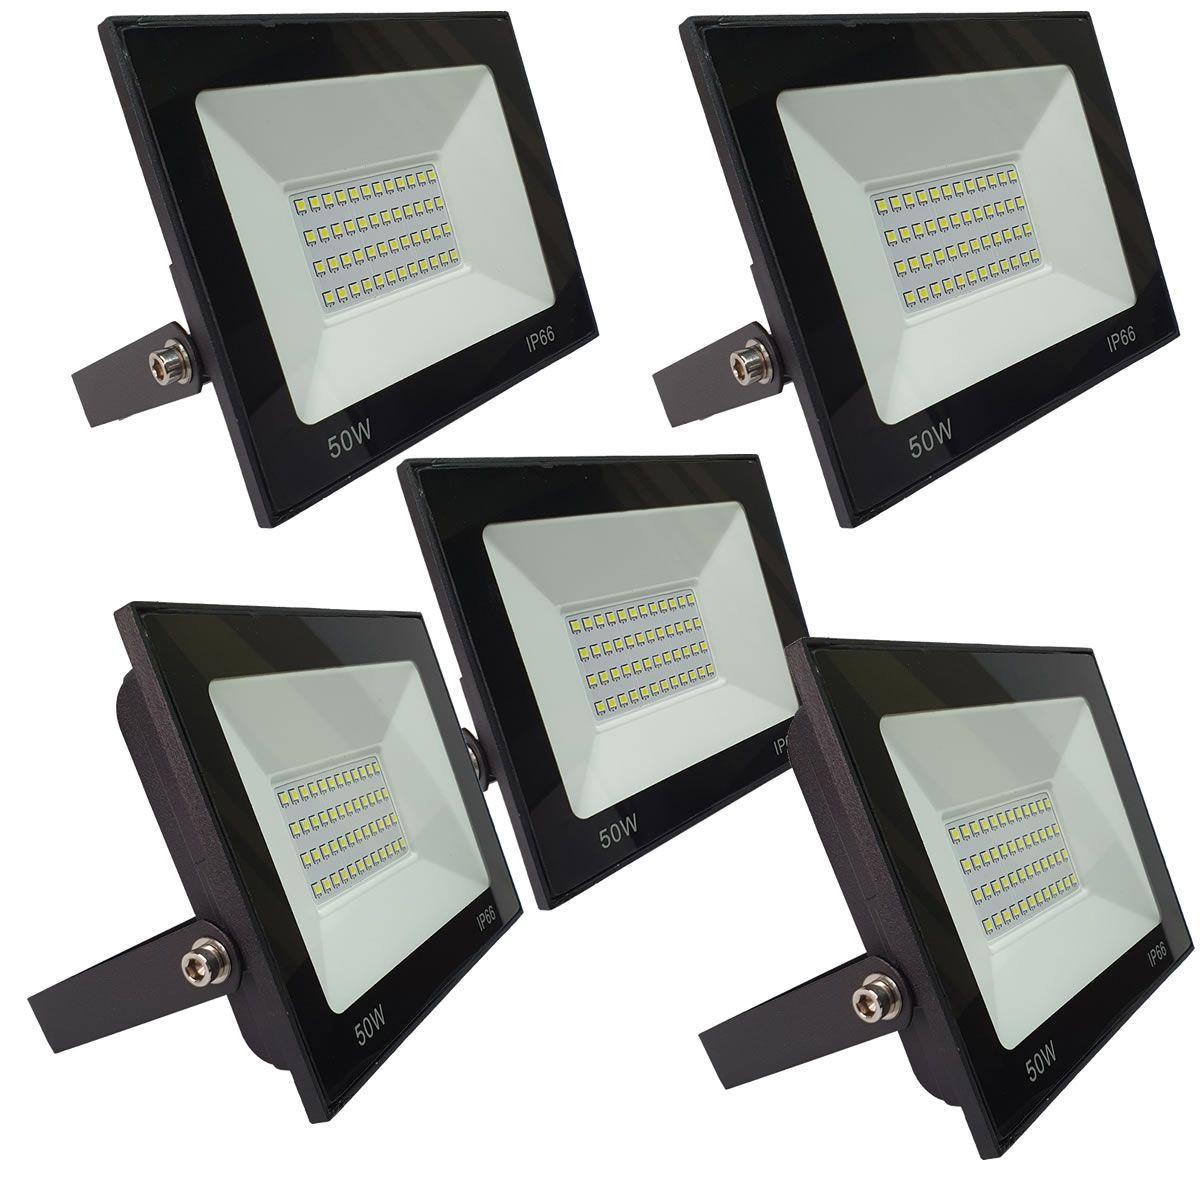 KIT 5 refletor 50w LED SMD Holofote Bivolt Externo Luz Branca